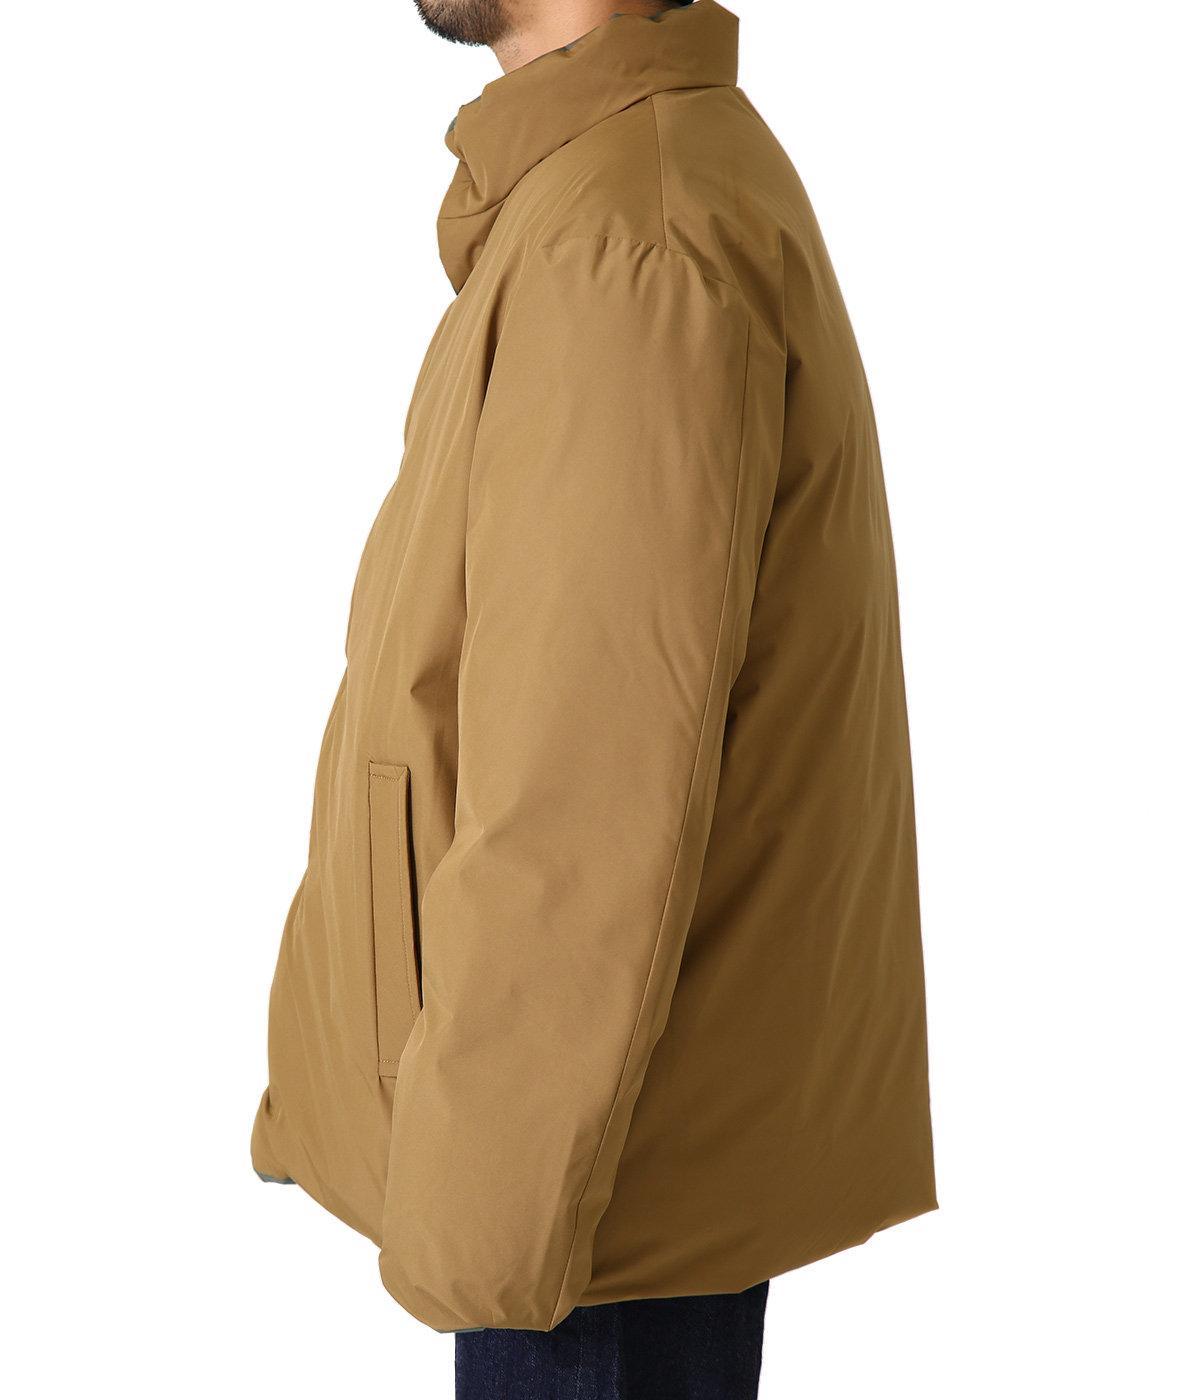 F/CE×DIGAWEL Reversible Down Jacket